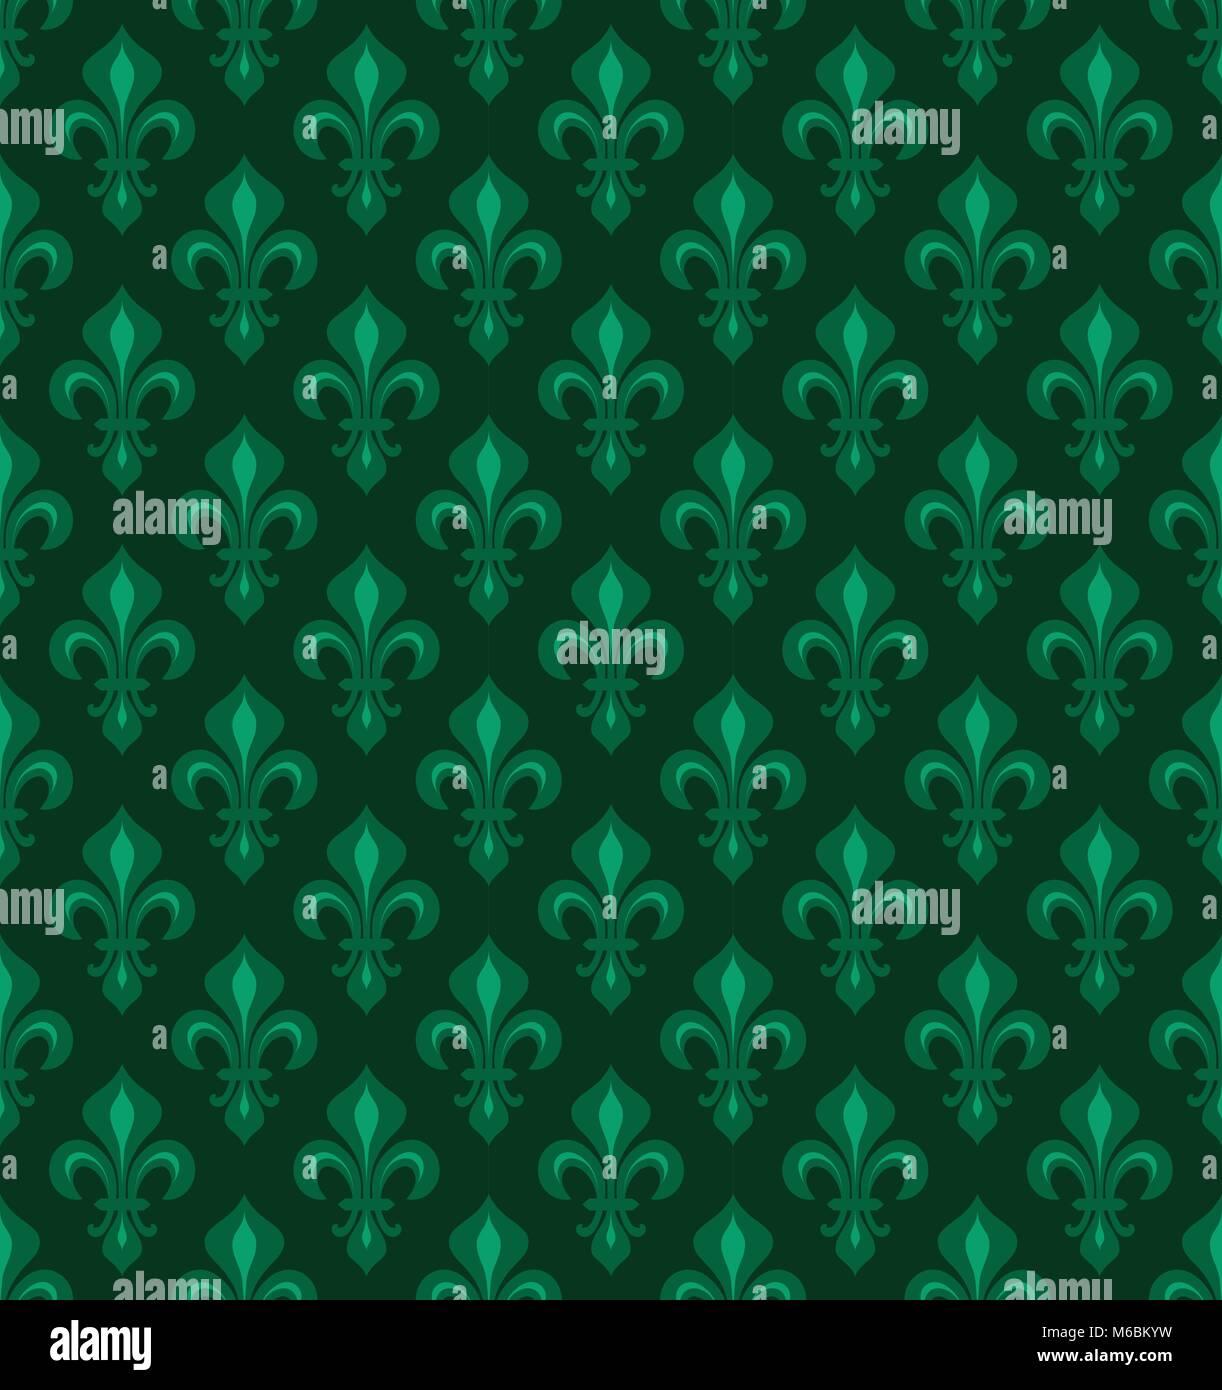 Royal Heraldic Lilies Fleur De Lis Emerald Green Velvet Seamless Pattern Wallpaper Background